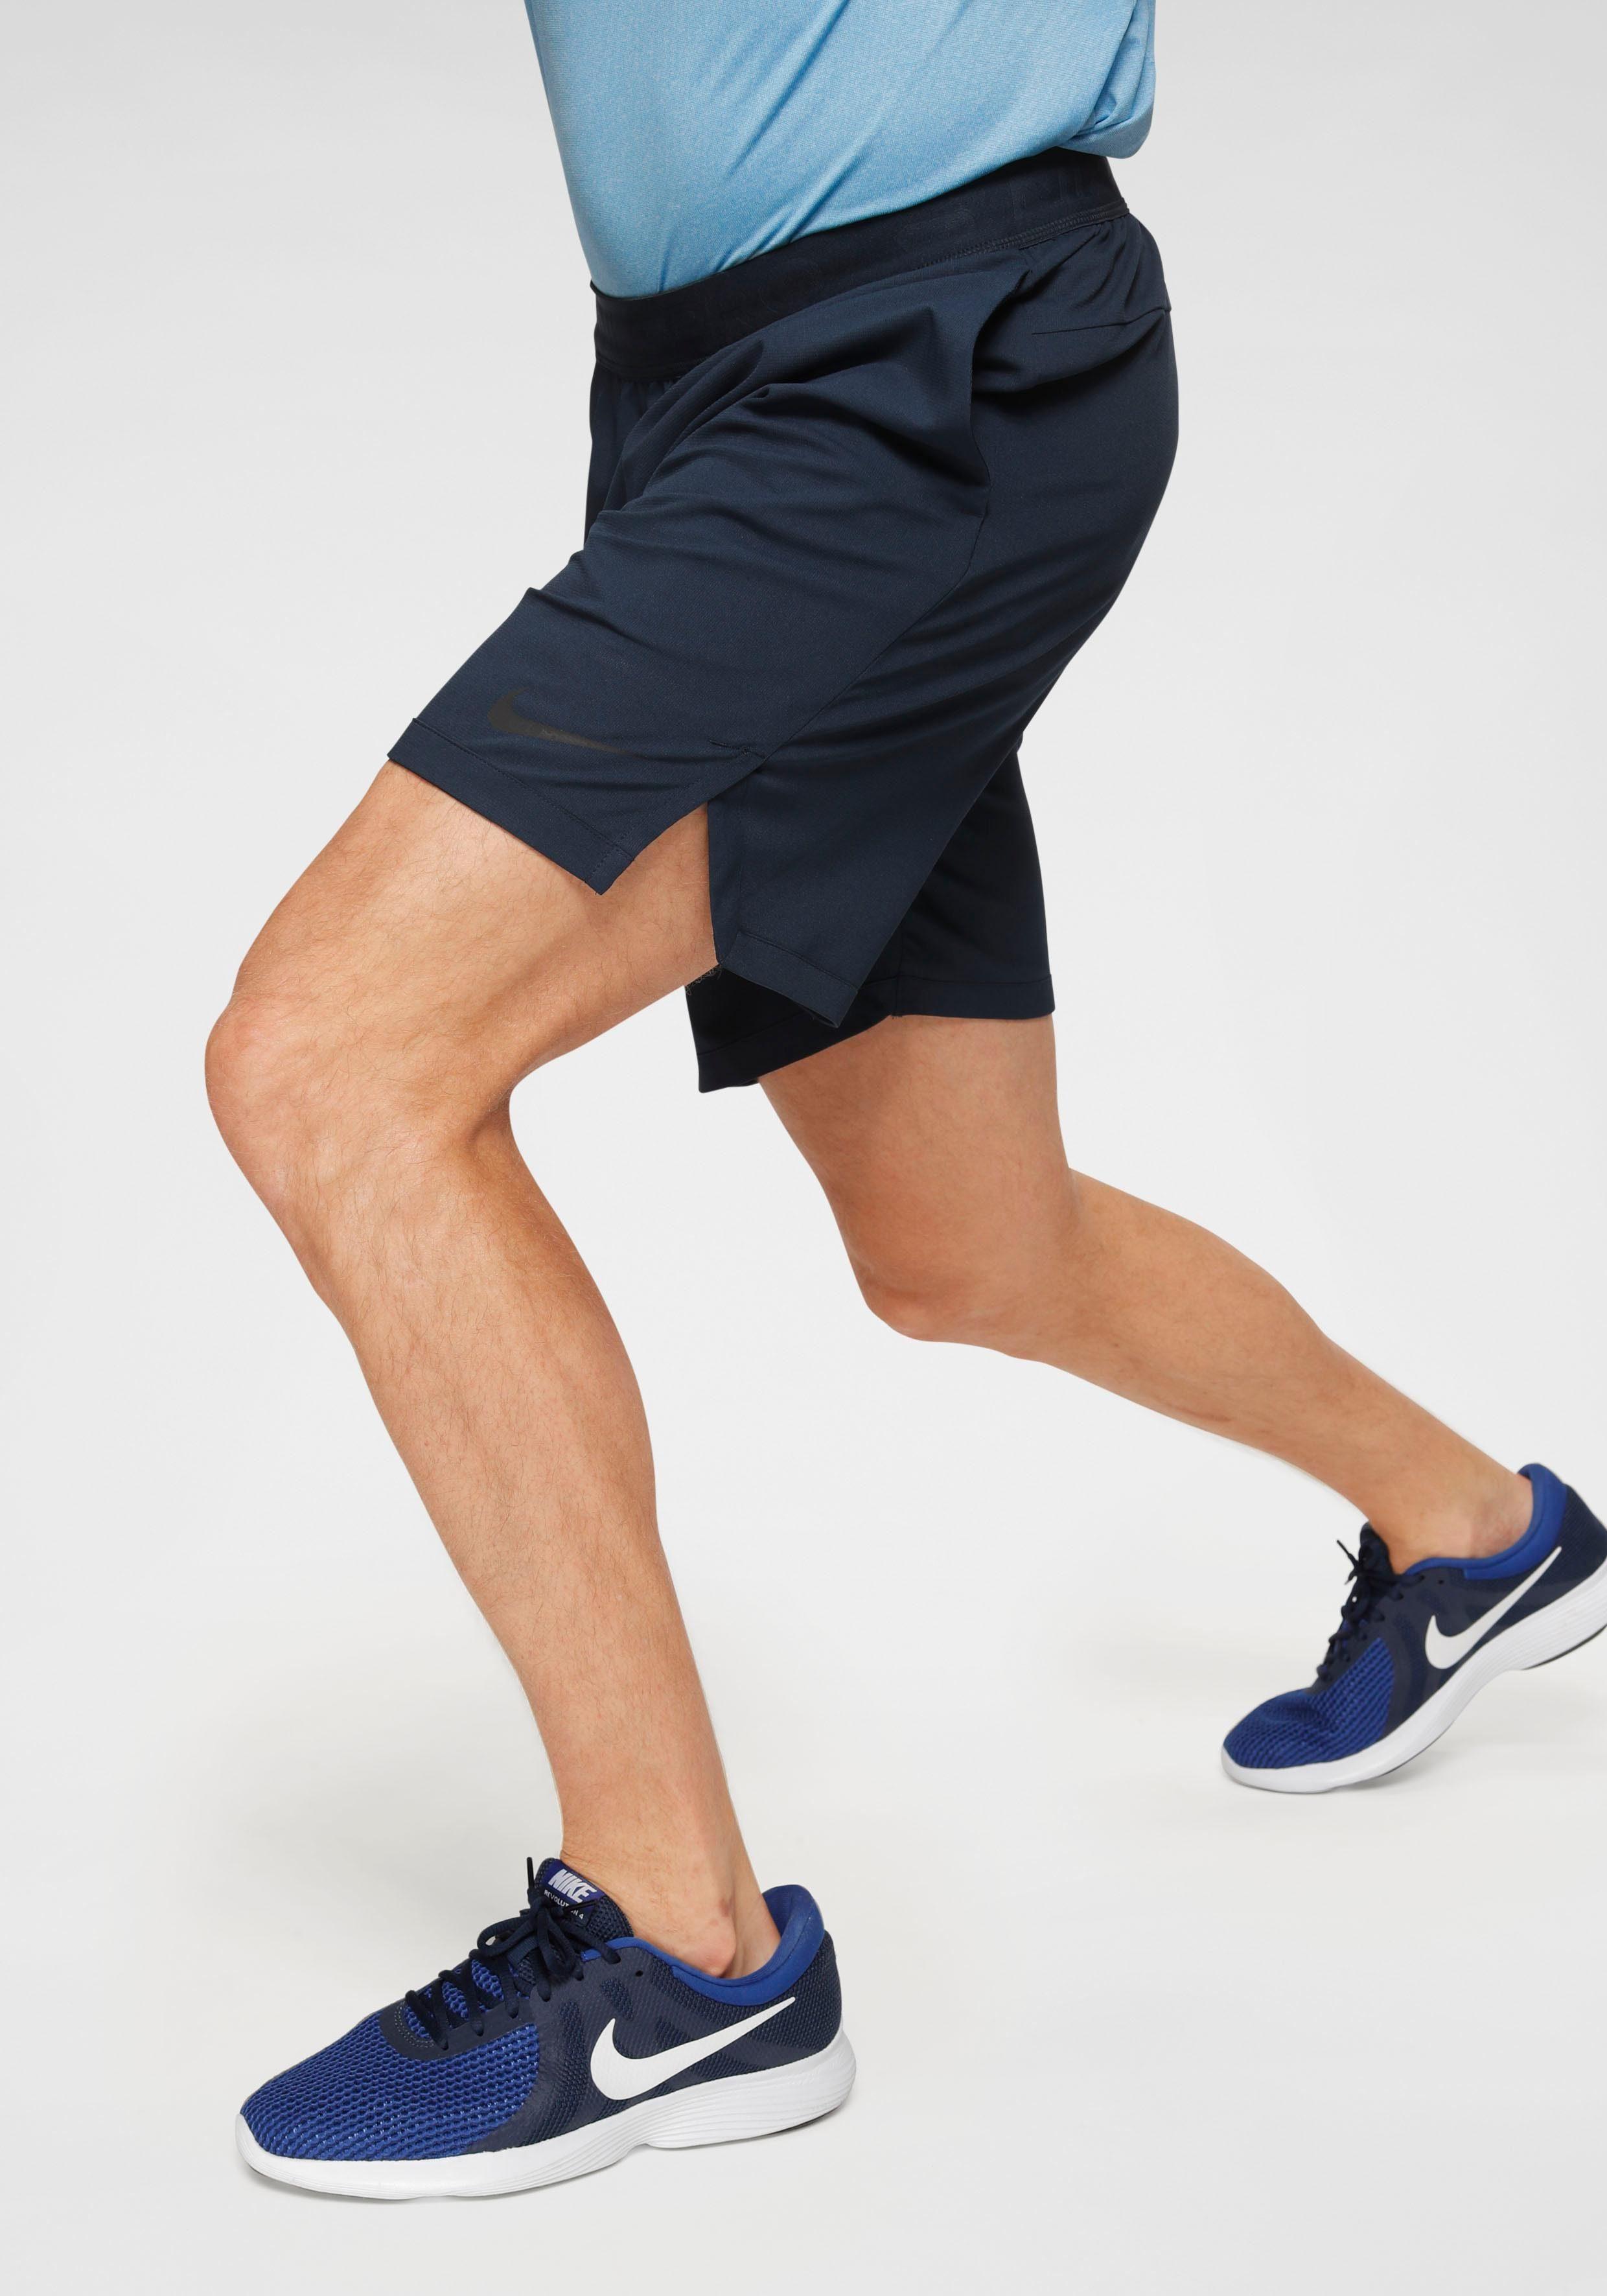 2018 19 Adidas Eclipse Select Dri Fit Training Shirts